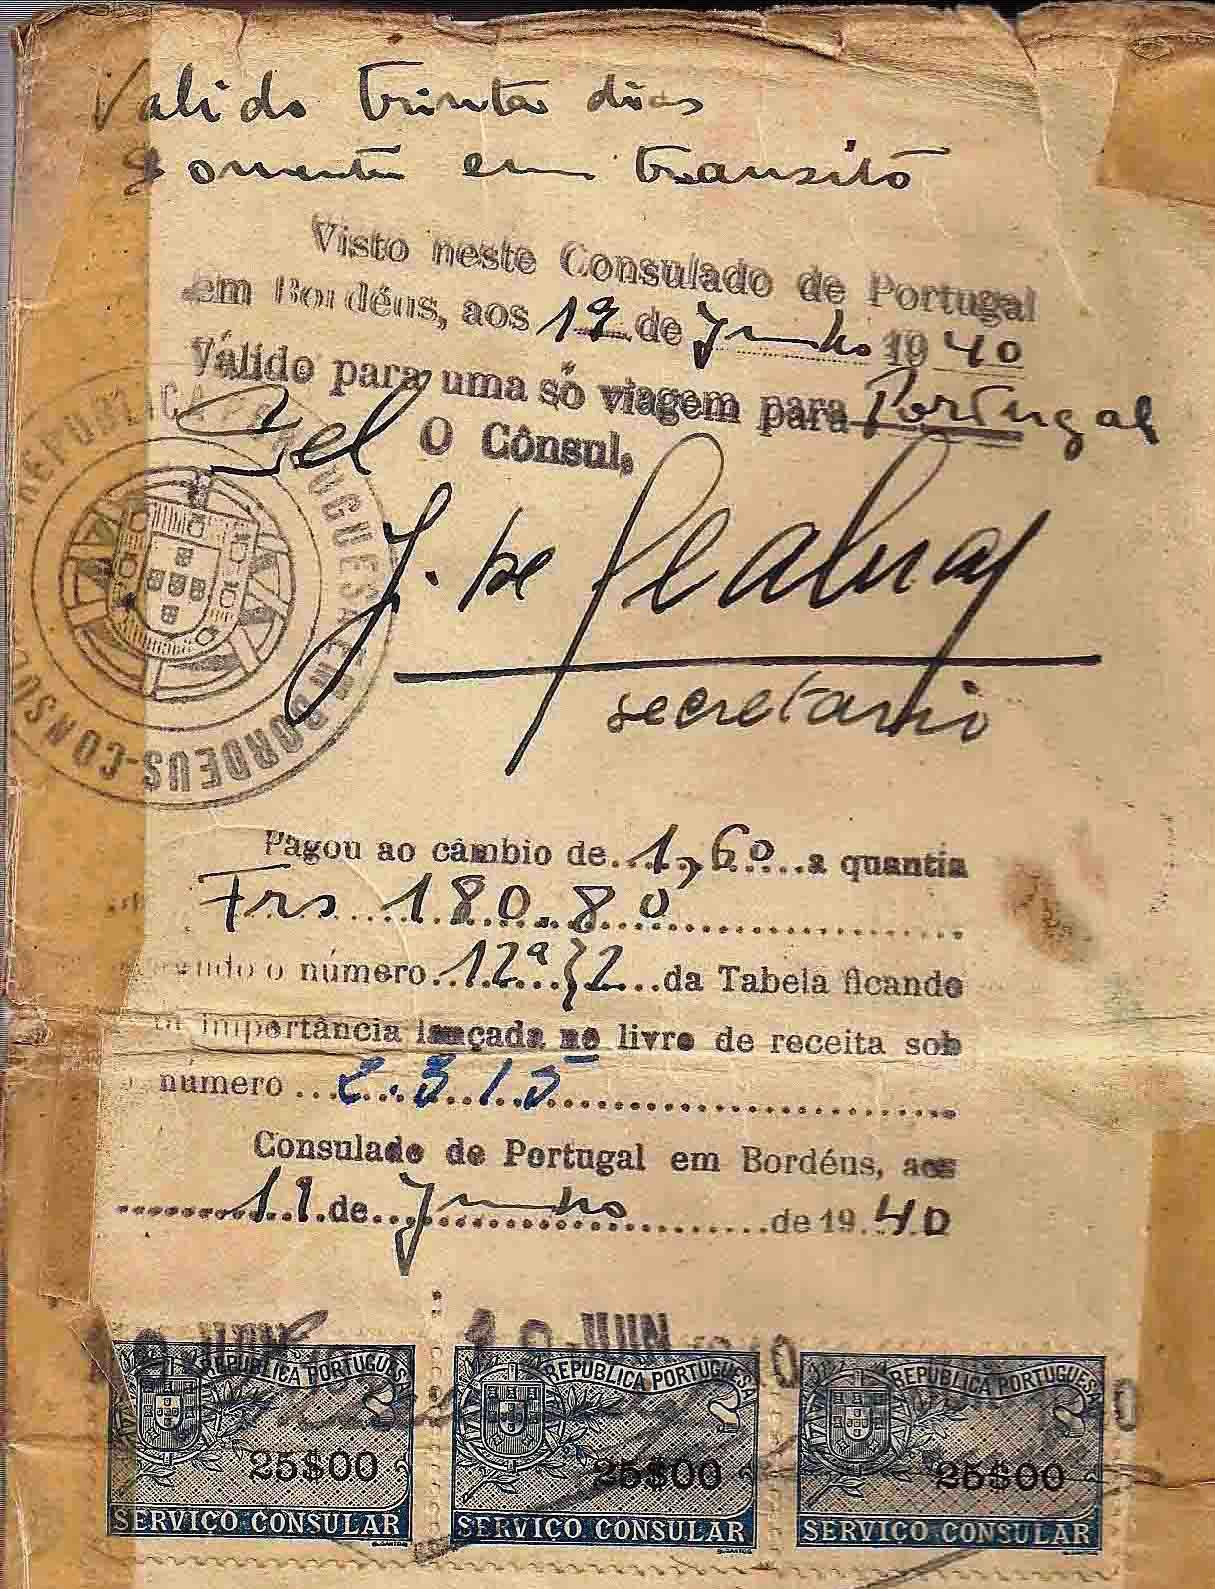 Life saving visa issued by Dr. Aristides de Sousa Mendes in June 19, 1940..jpg